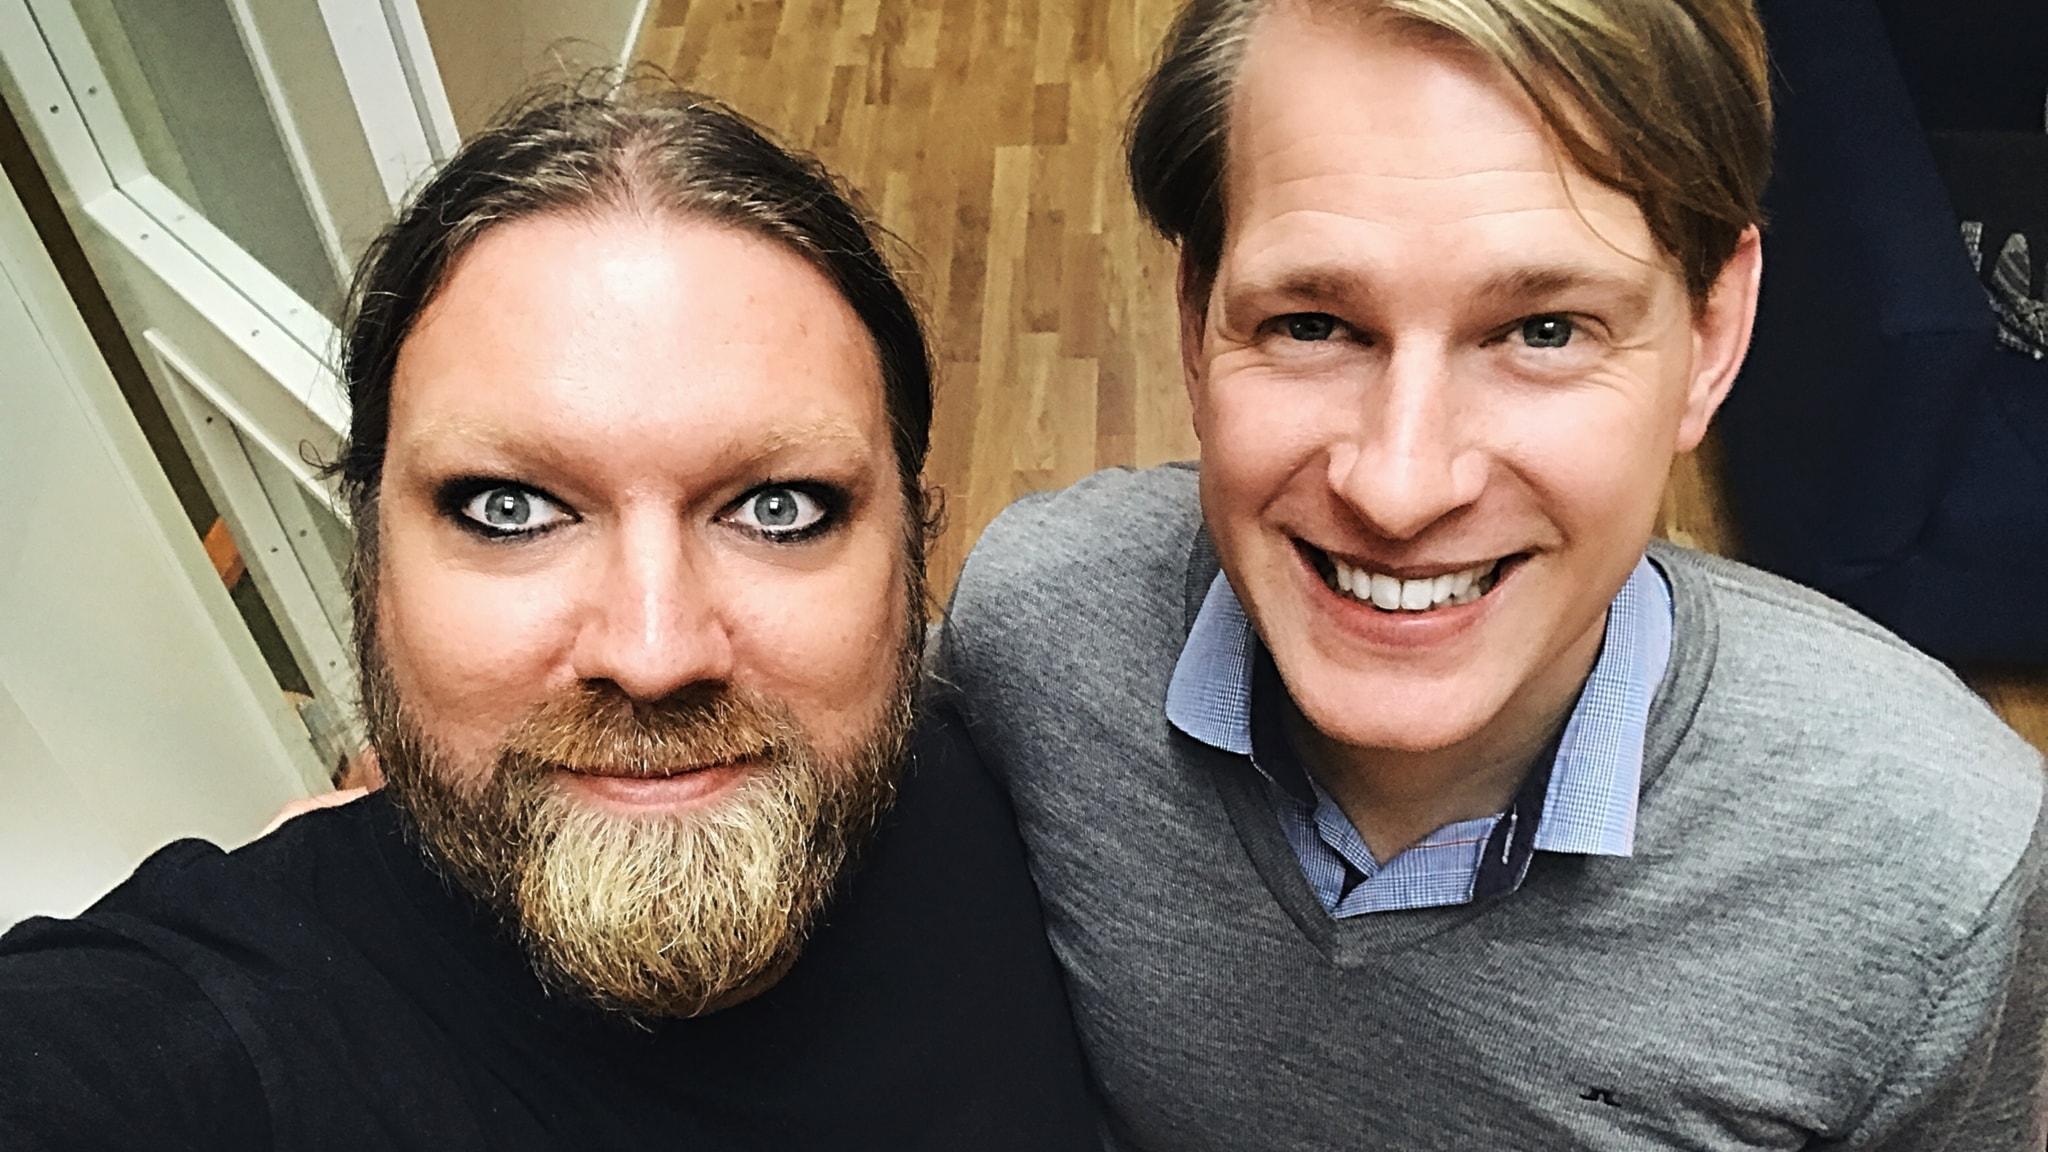 På besök i operaorkesterns dike med gäst Magnus Wretblad